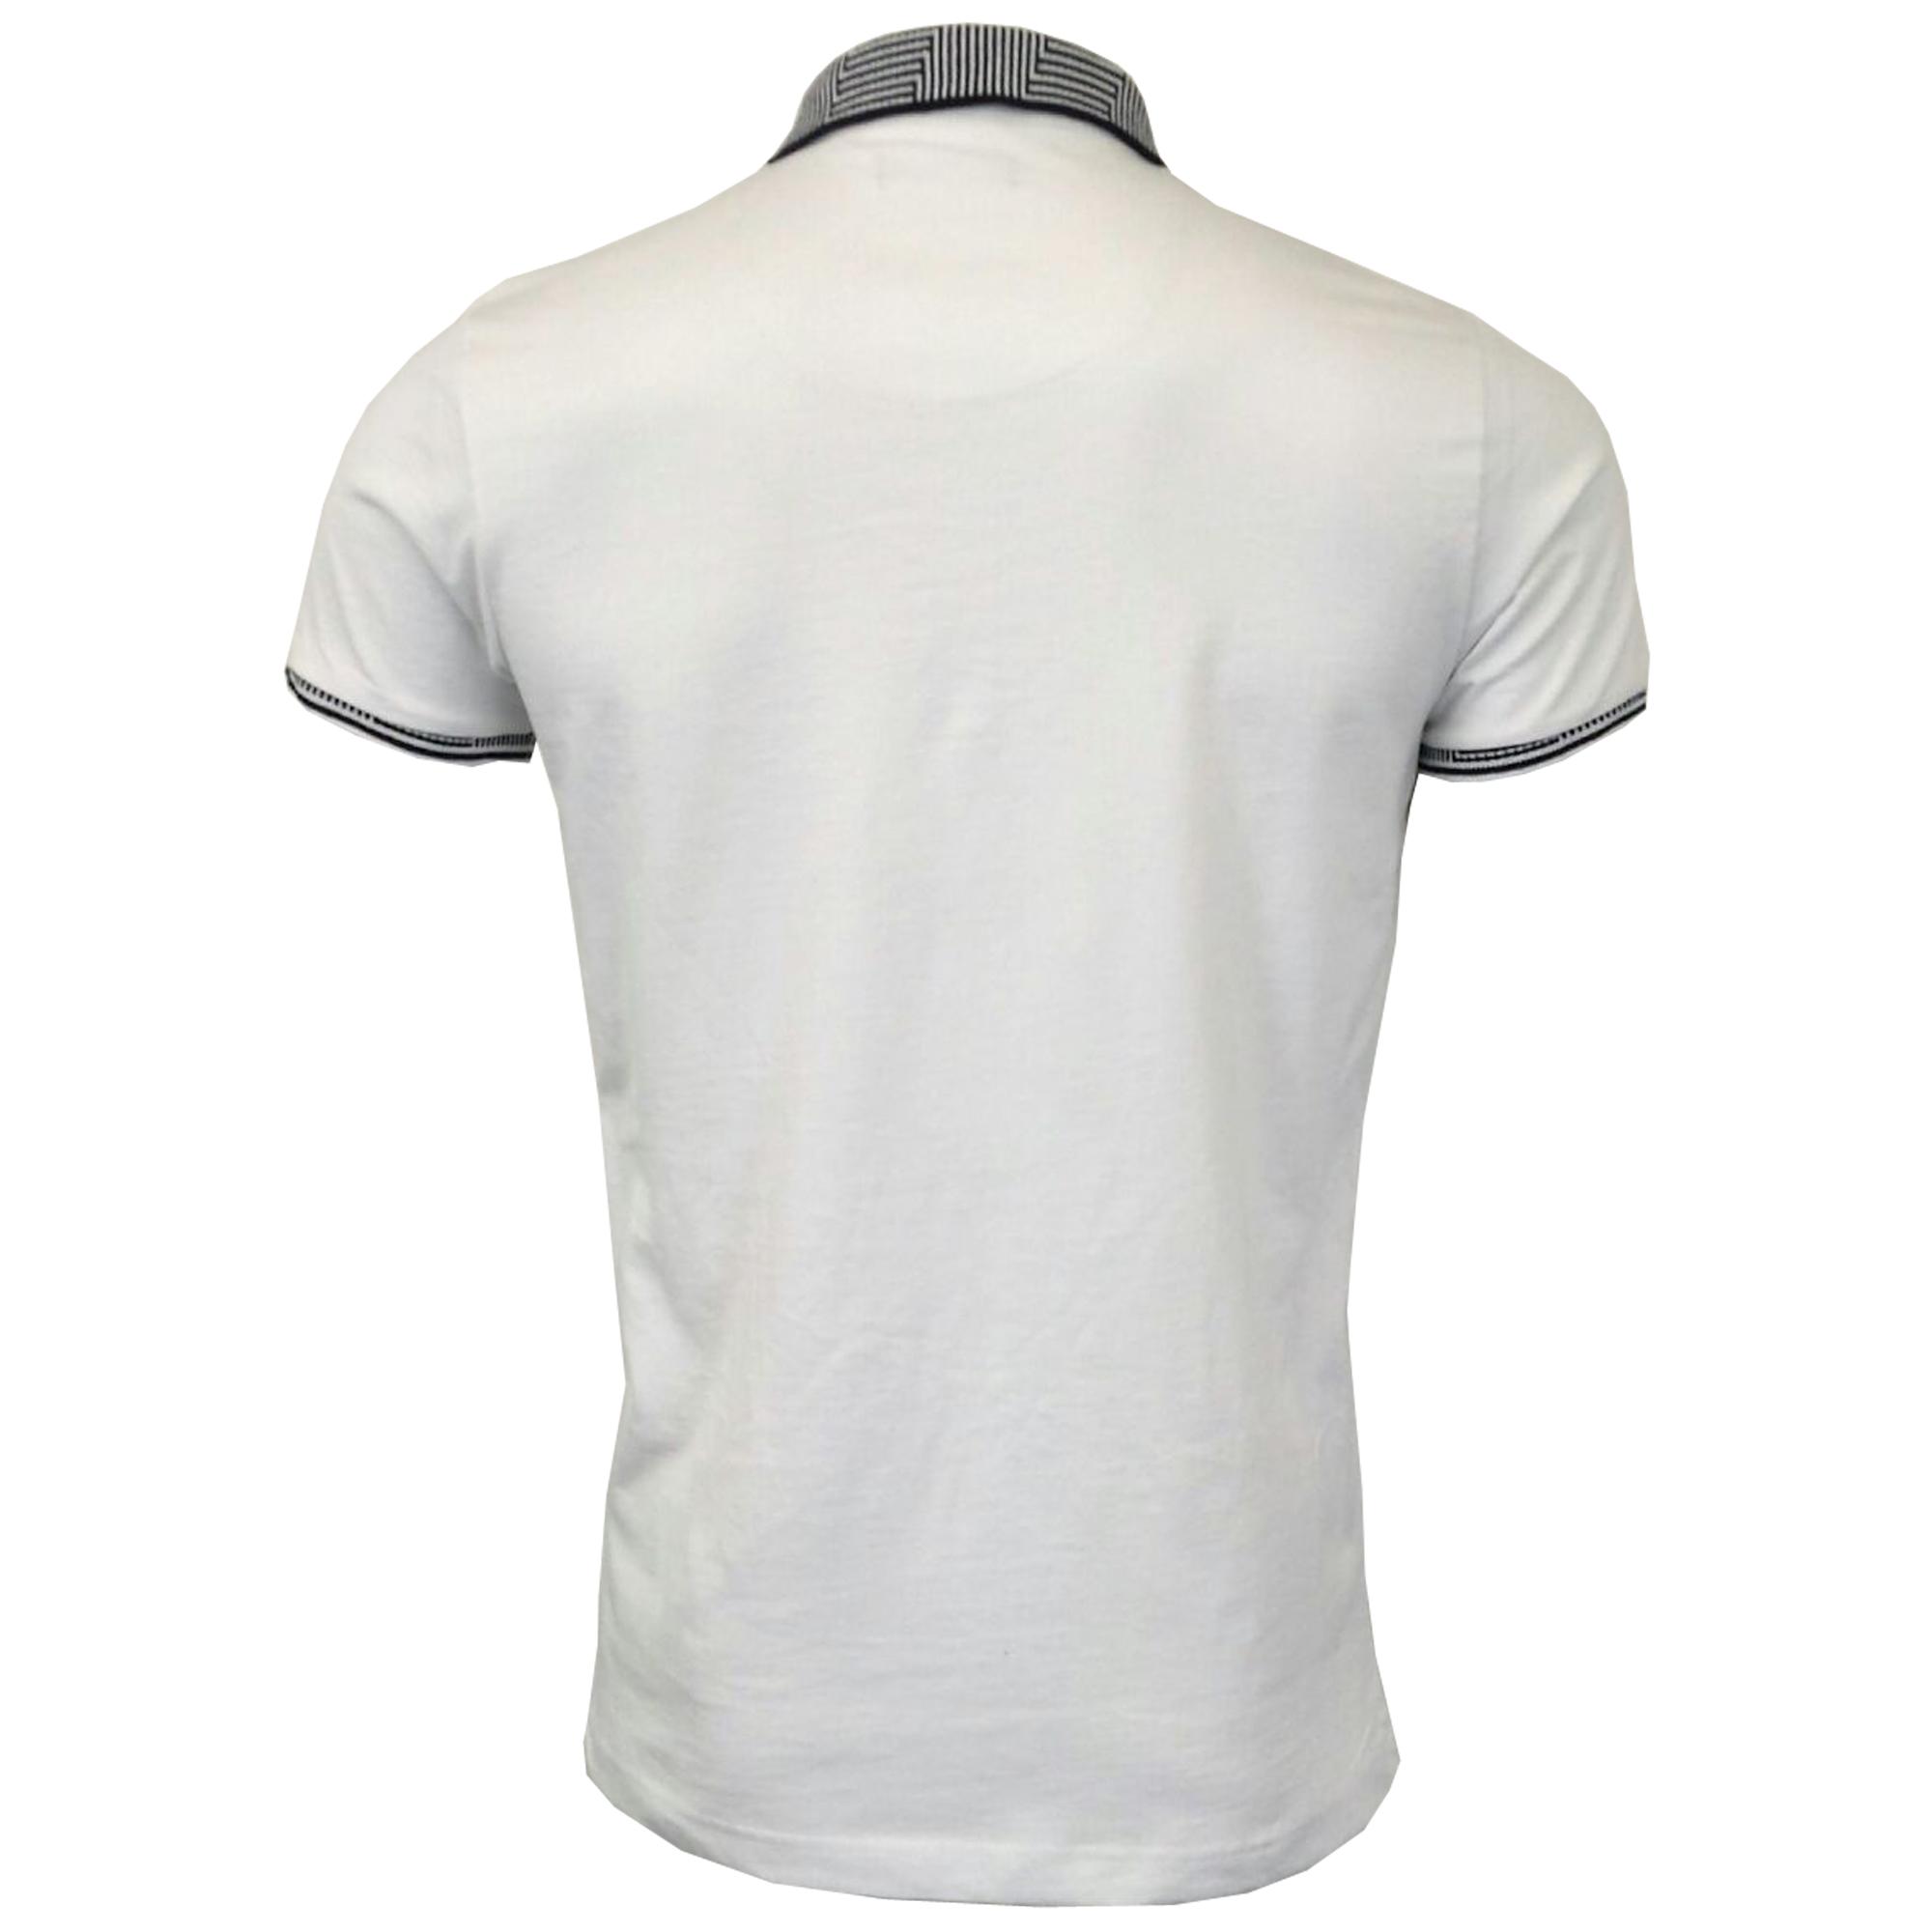 Mens-Polo-T-Shirt-Brave-Soul-Short-Sleeved-Cotton-GLOVER-Collared-KHALIFA-Summer thumbnail 18